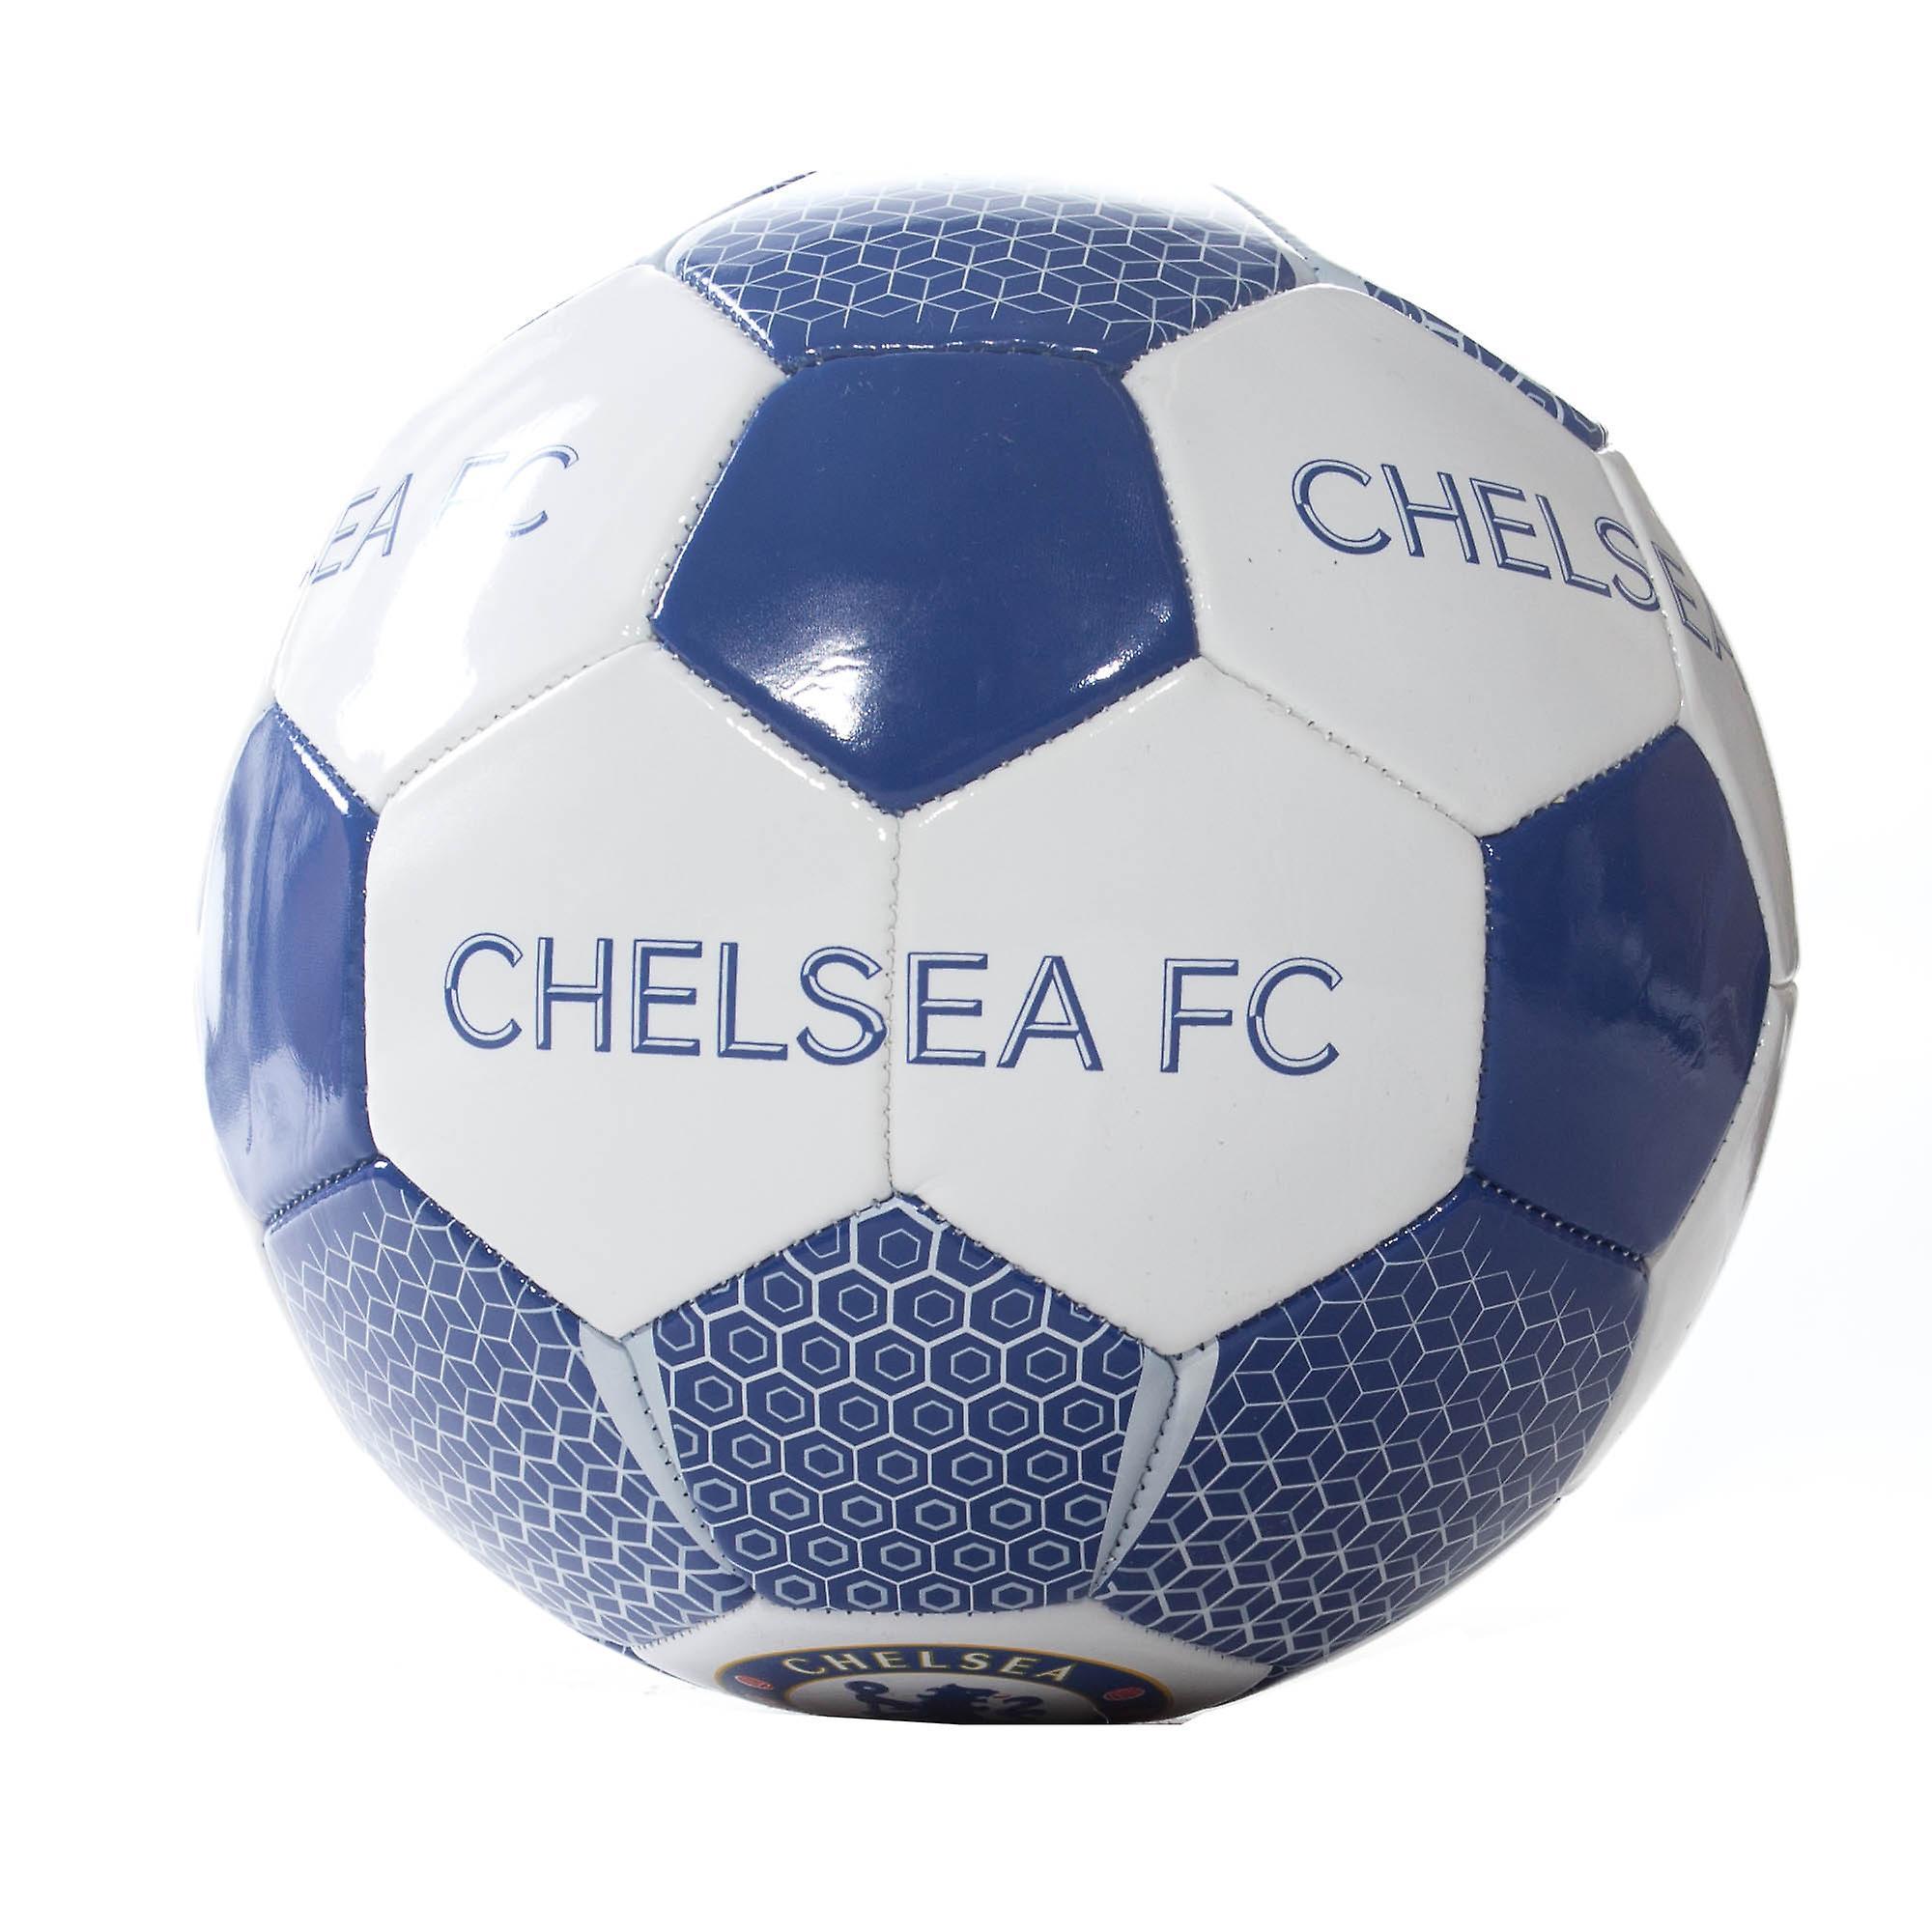 Chelsea FC Official Supporter Football Soccer Ball White/Blue - Size 5